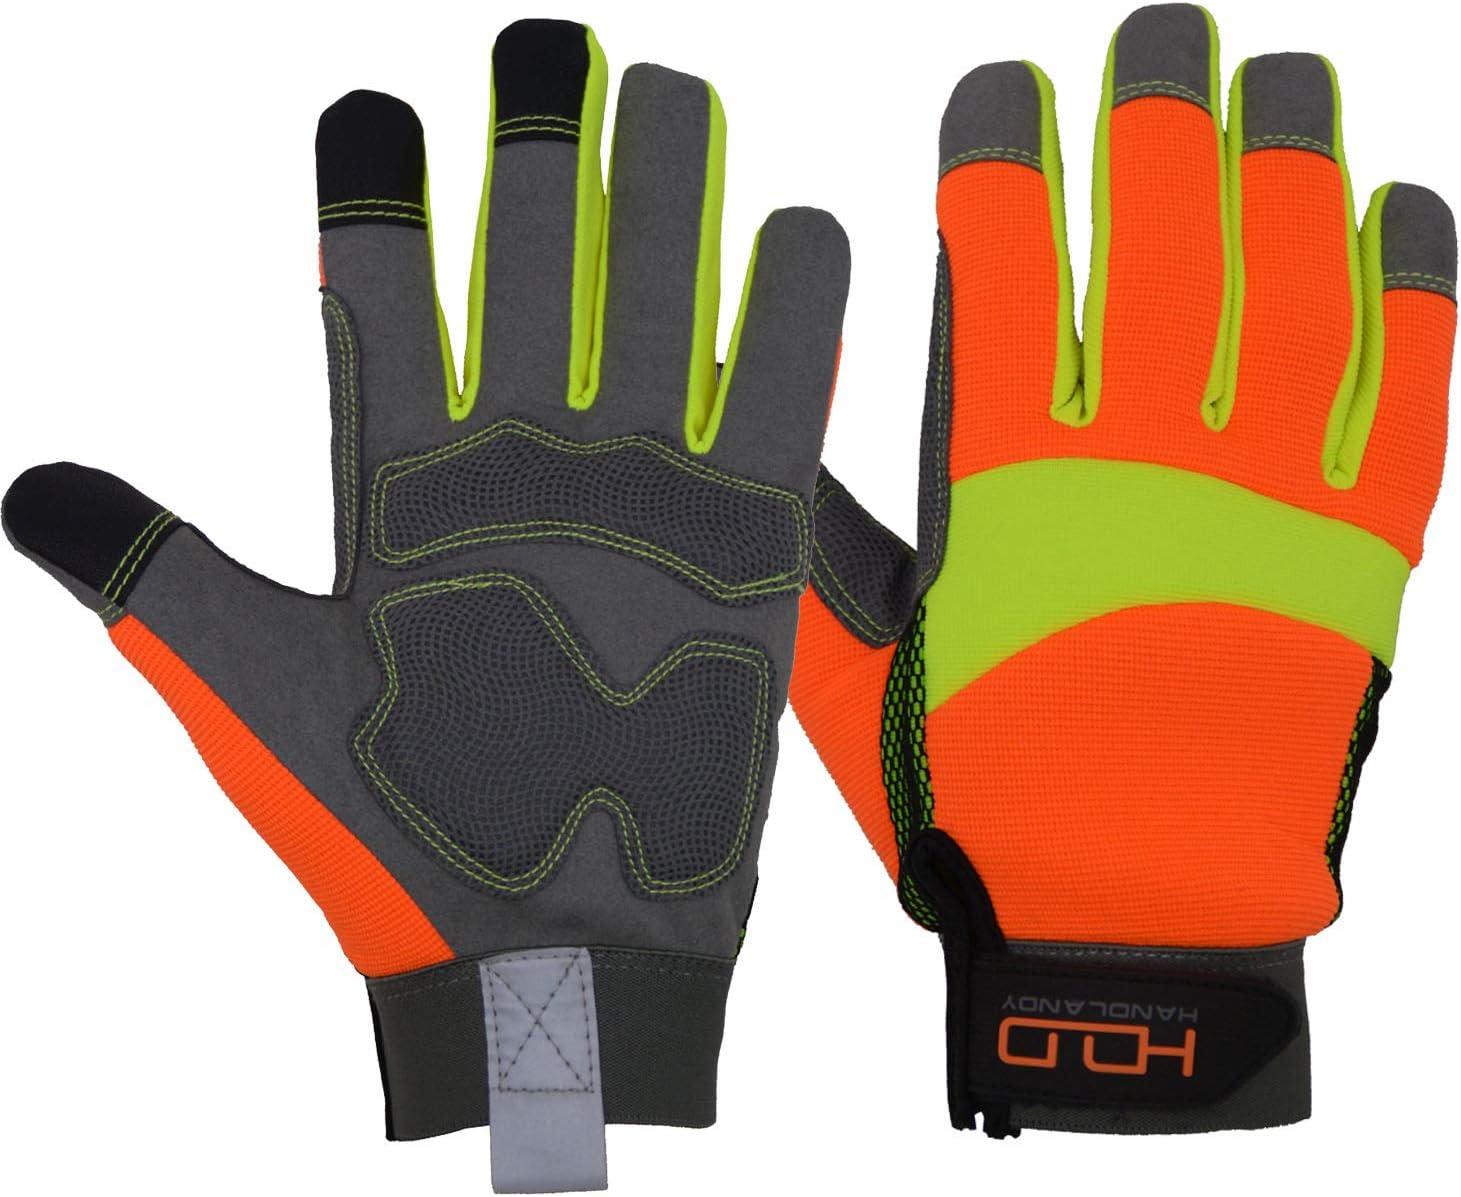 HANDLANDY Orange Brand new Reflective Gloves Safety lowest price High Vis Antivibratio